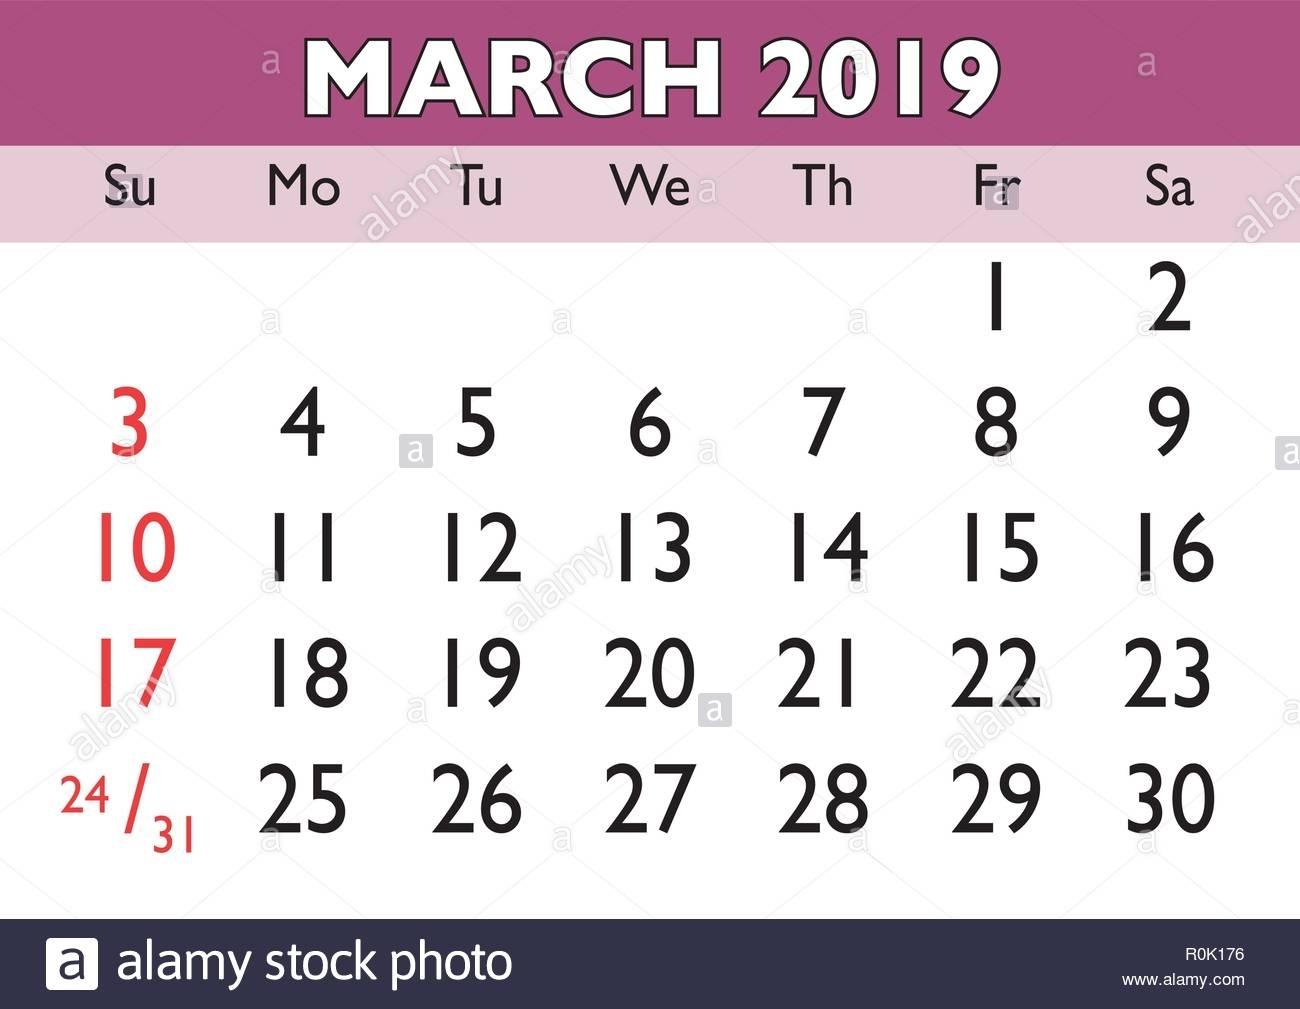 2019 Calendar March Month. Vector Printable Calendar. Monthly Is A Calendar Month 4 Weeks